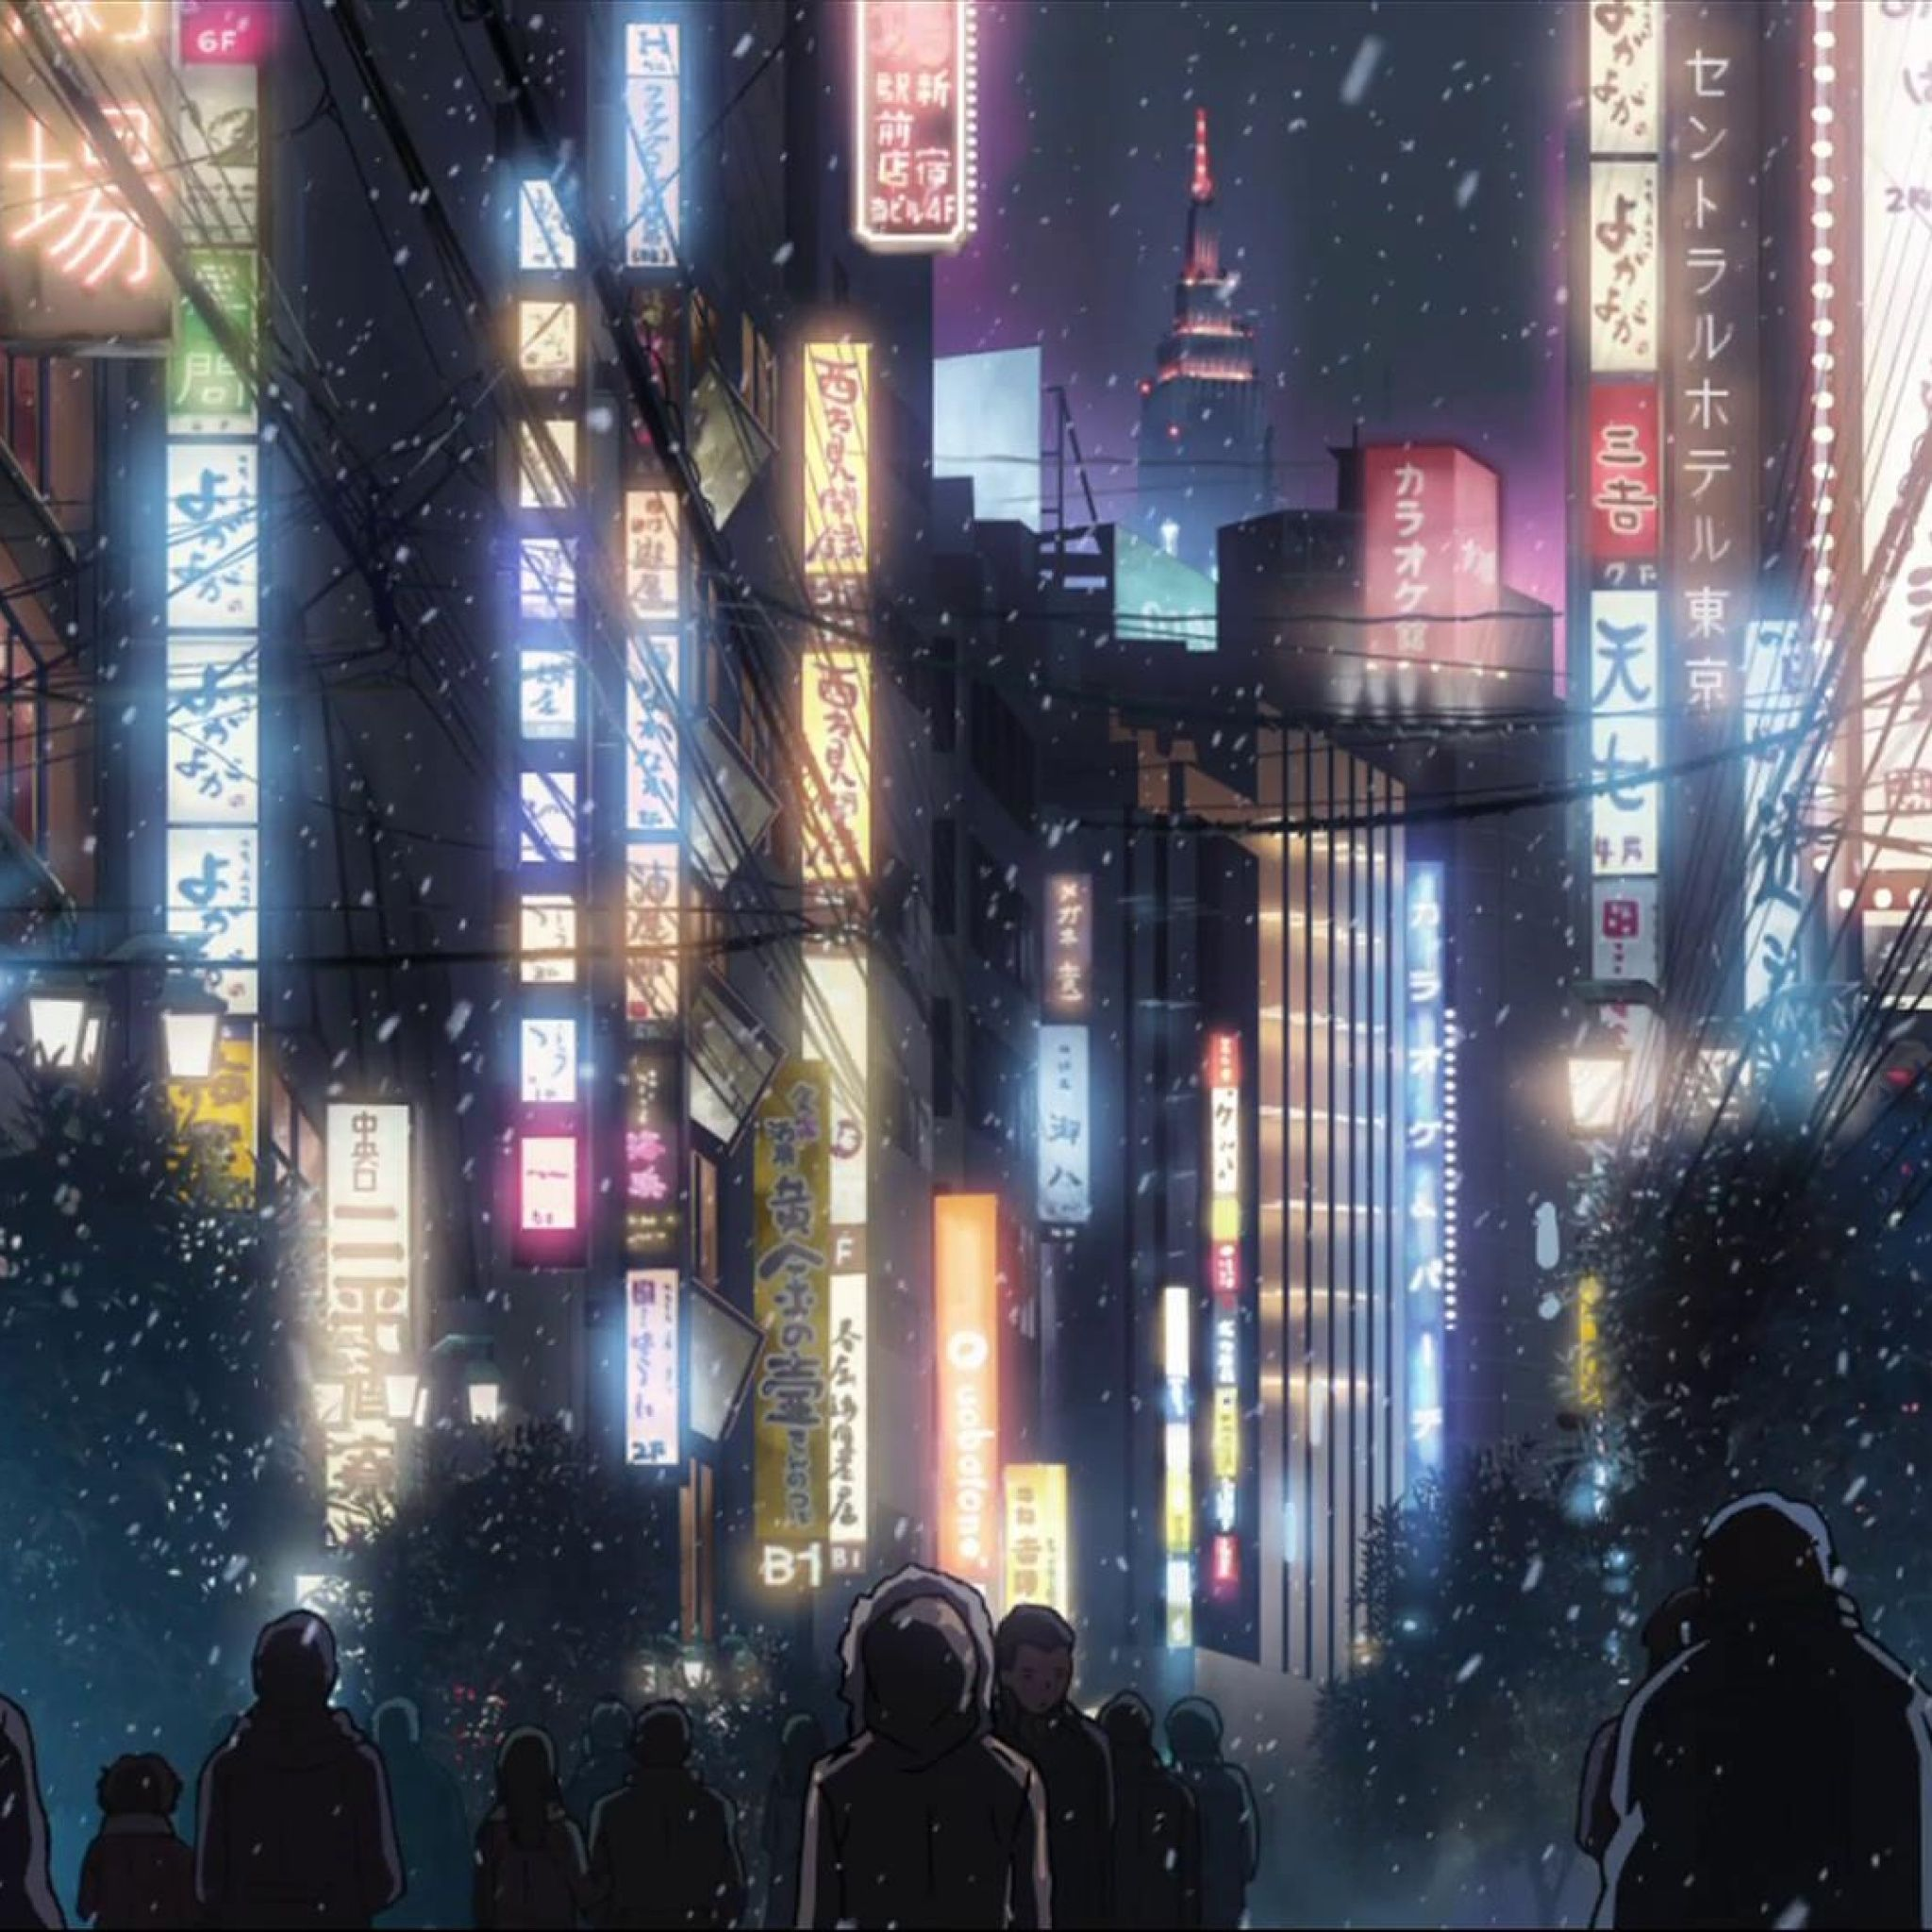 Pin On Ipad Wallpaper Landscape Ipad Air Wallpaper Anime Scenery Wallpaper Anime City Anime wallpaper for ipad hd